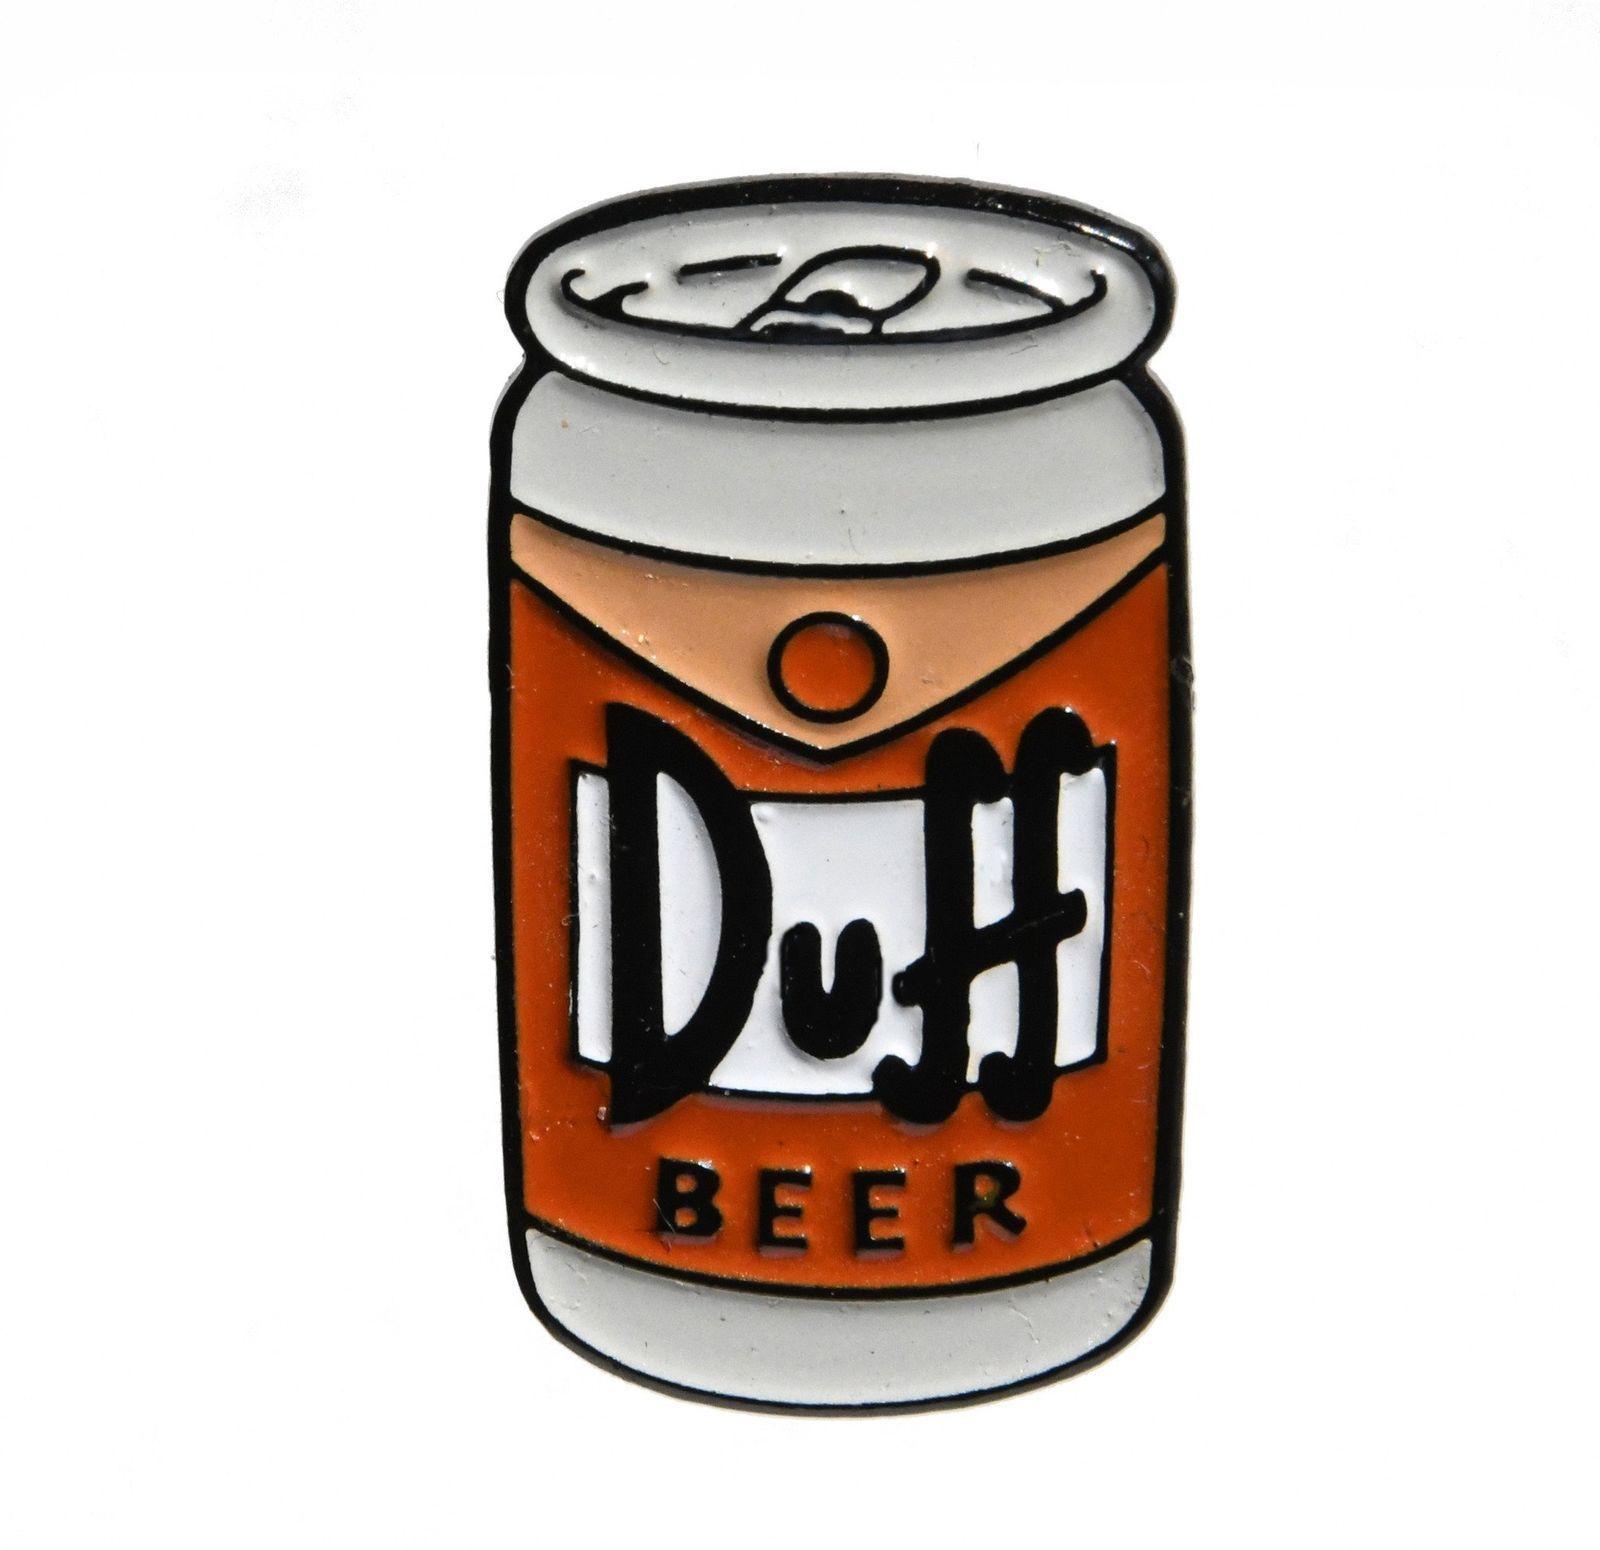 Duff Beer Simpsons Enamel Pin eBay Tatuajes de cerveza